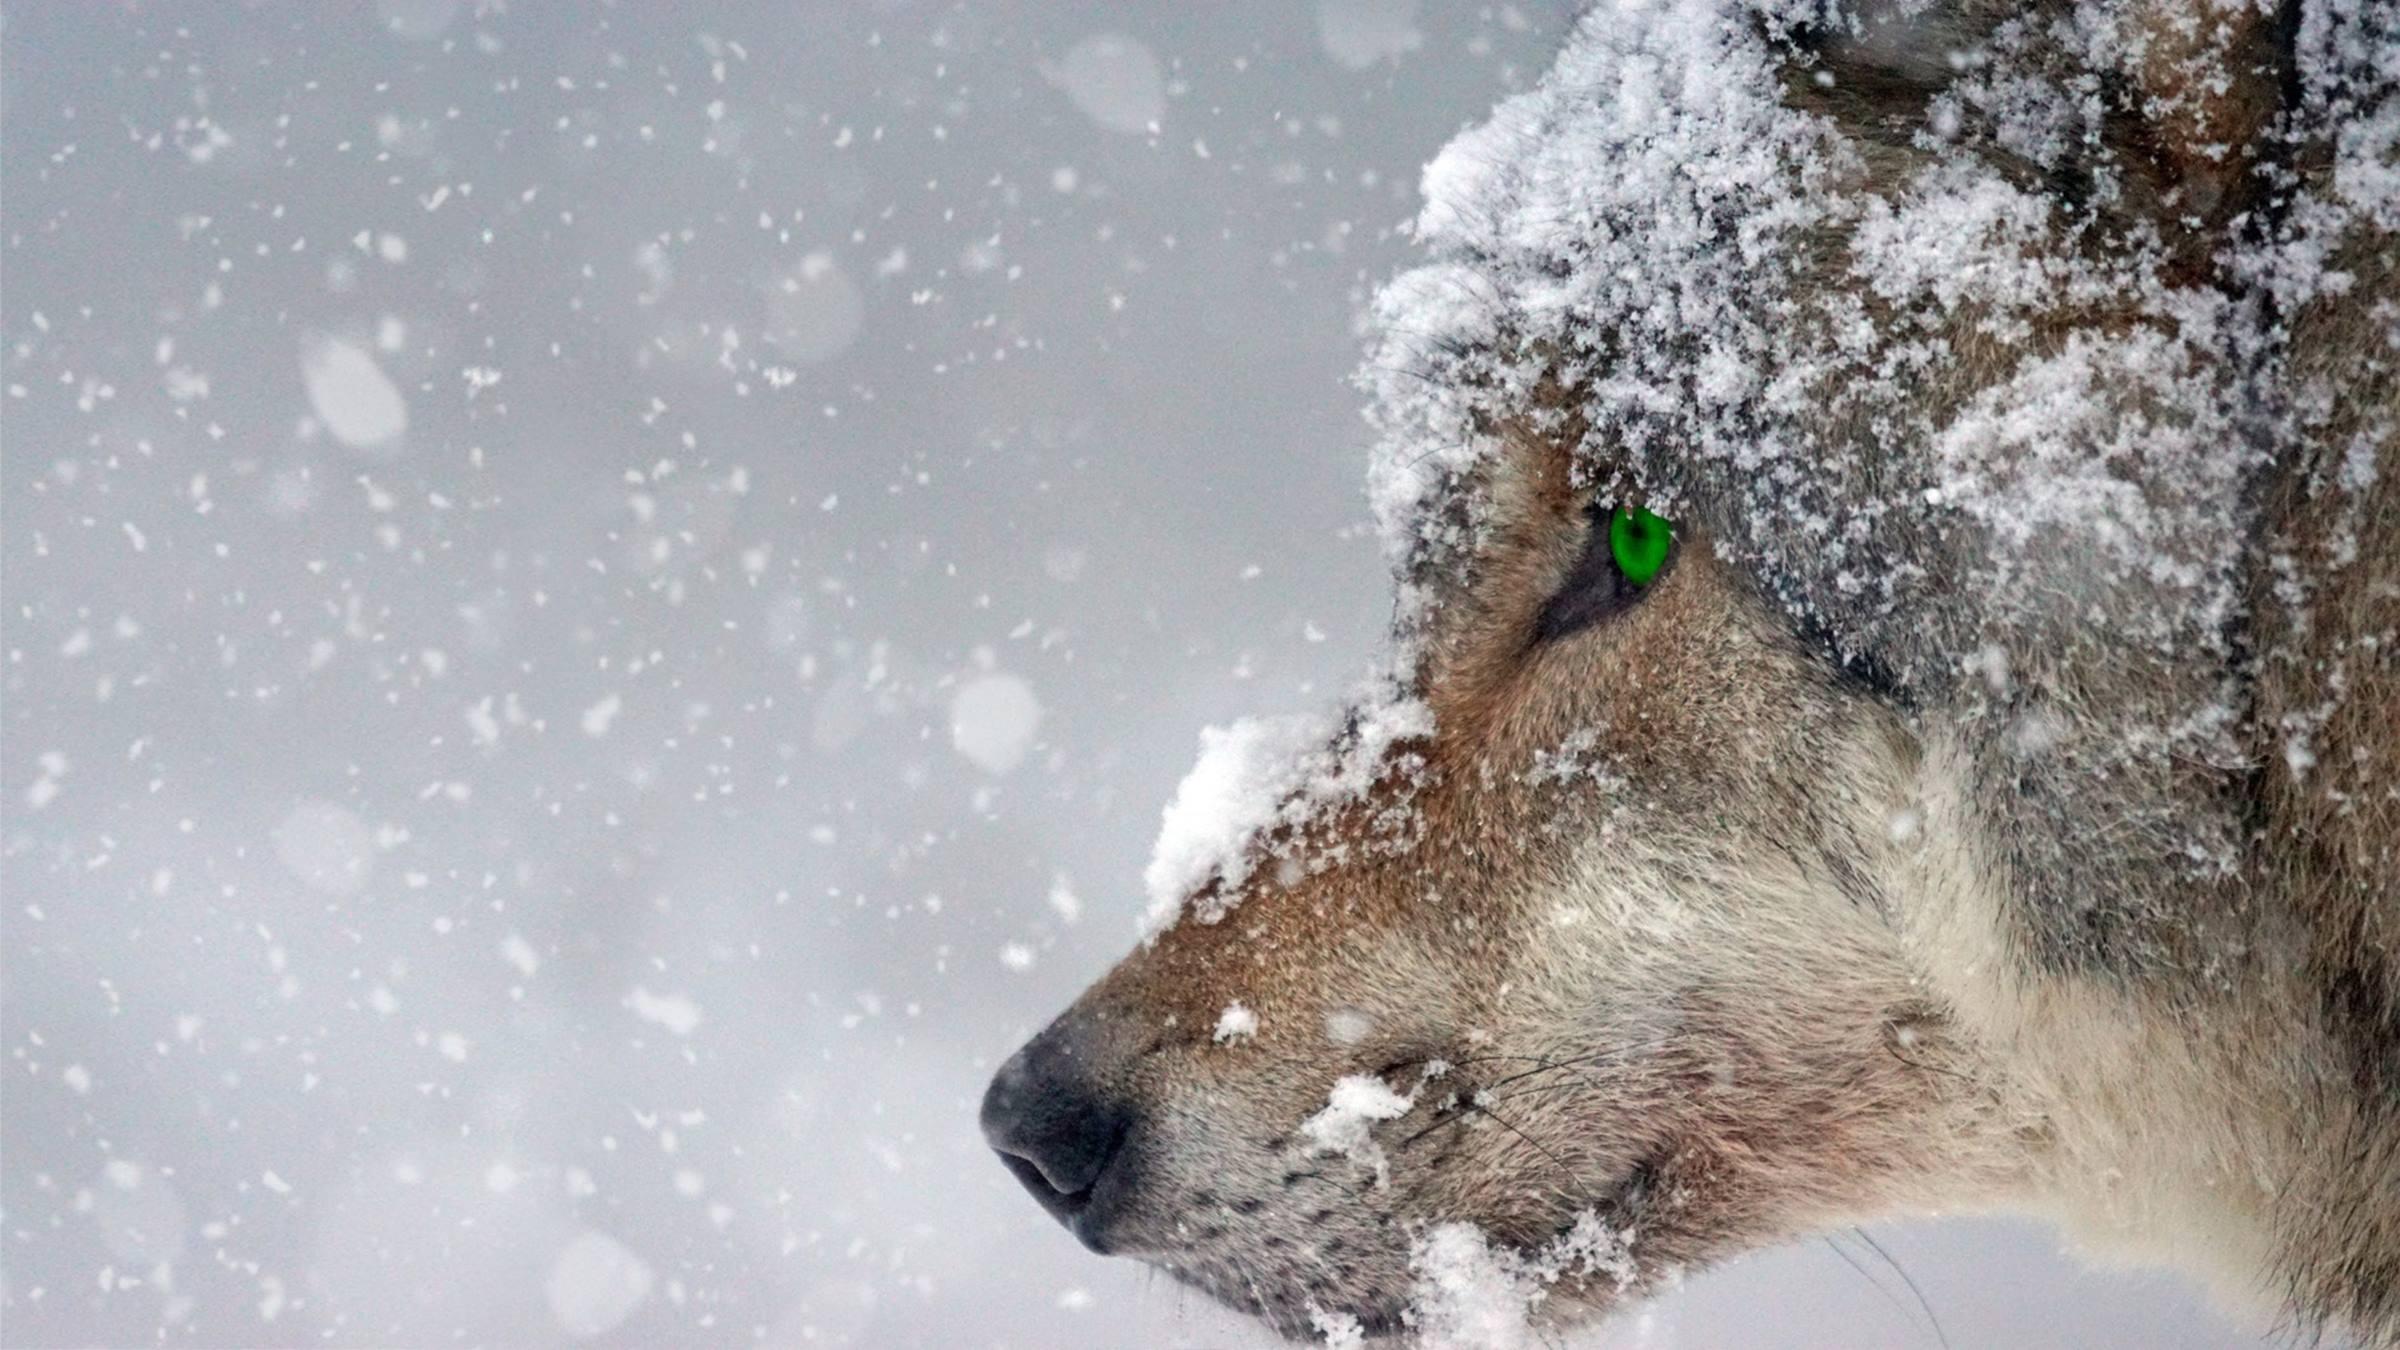 winterwolf snowing snow portrait animal